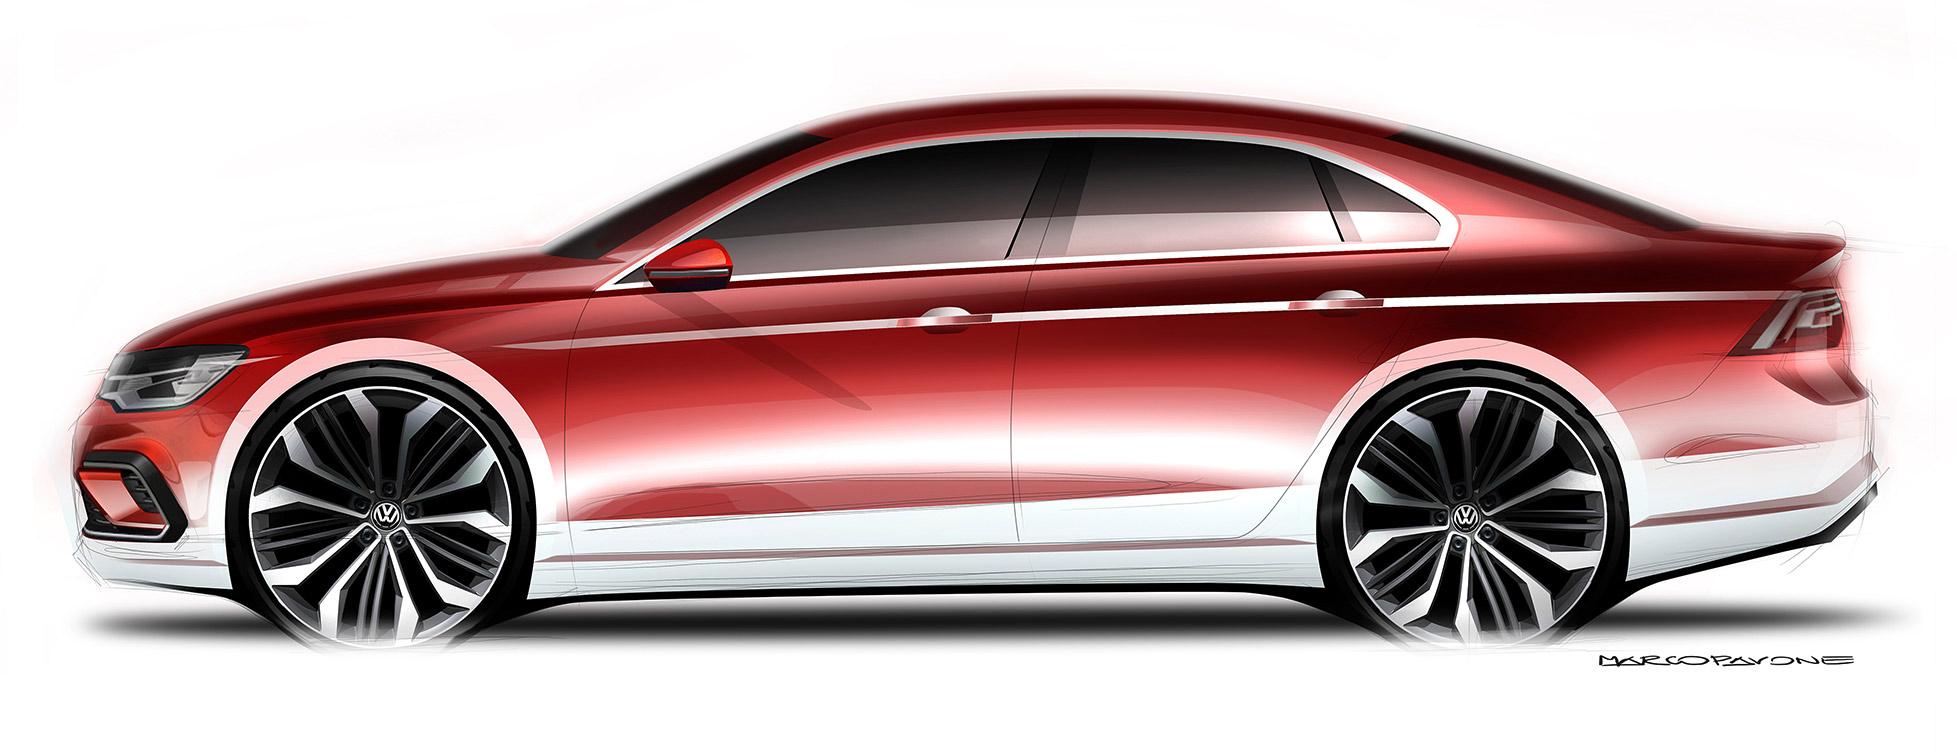 volkswagen-midsize-coupe-concept-3